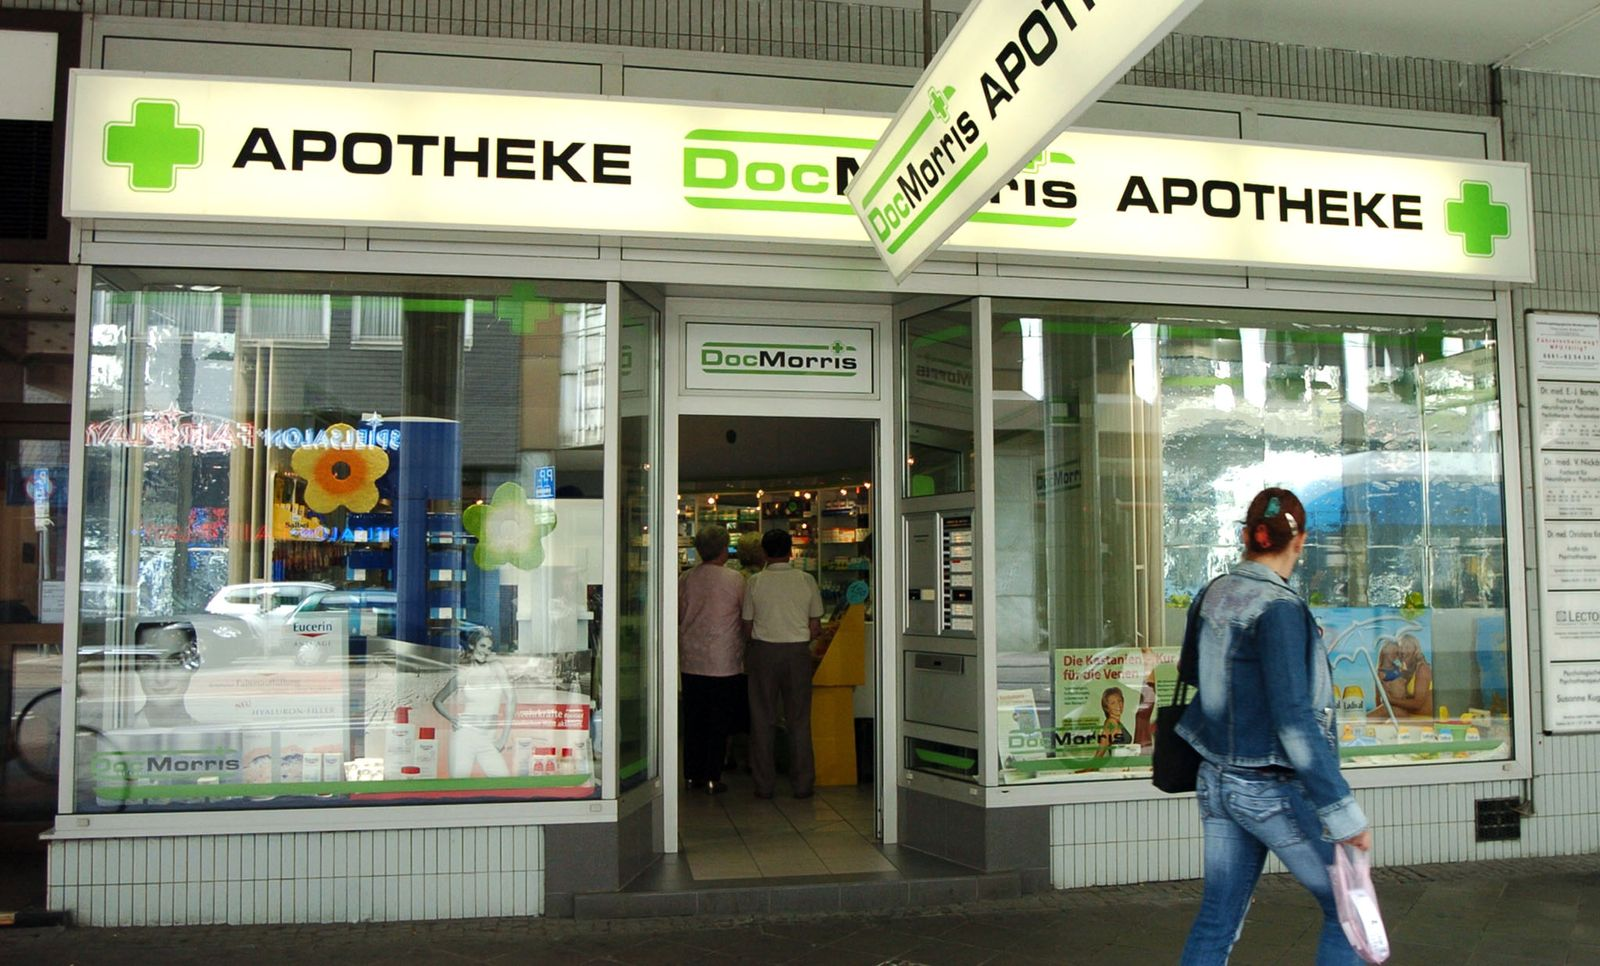 Apotheken / DocMorris